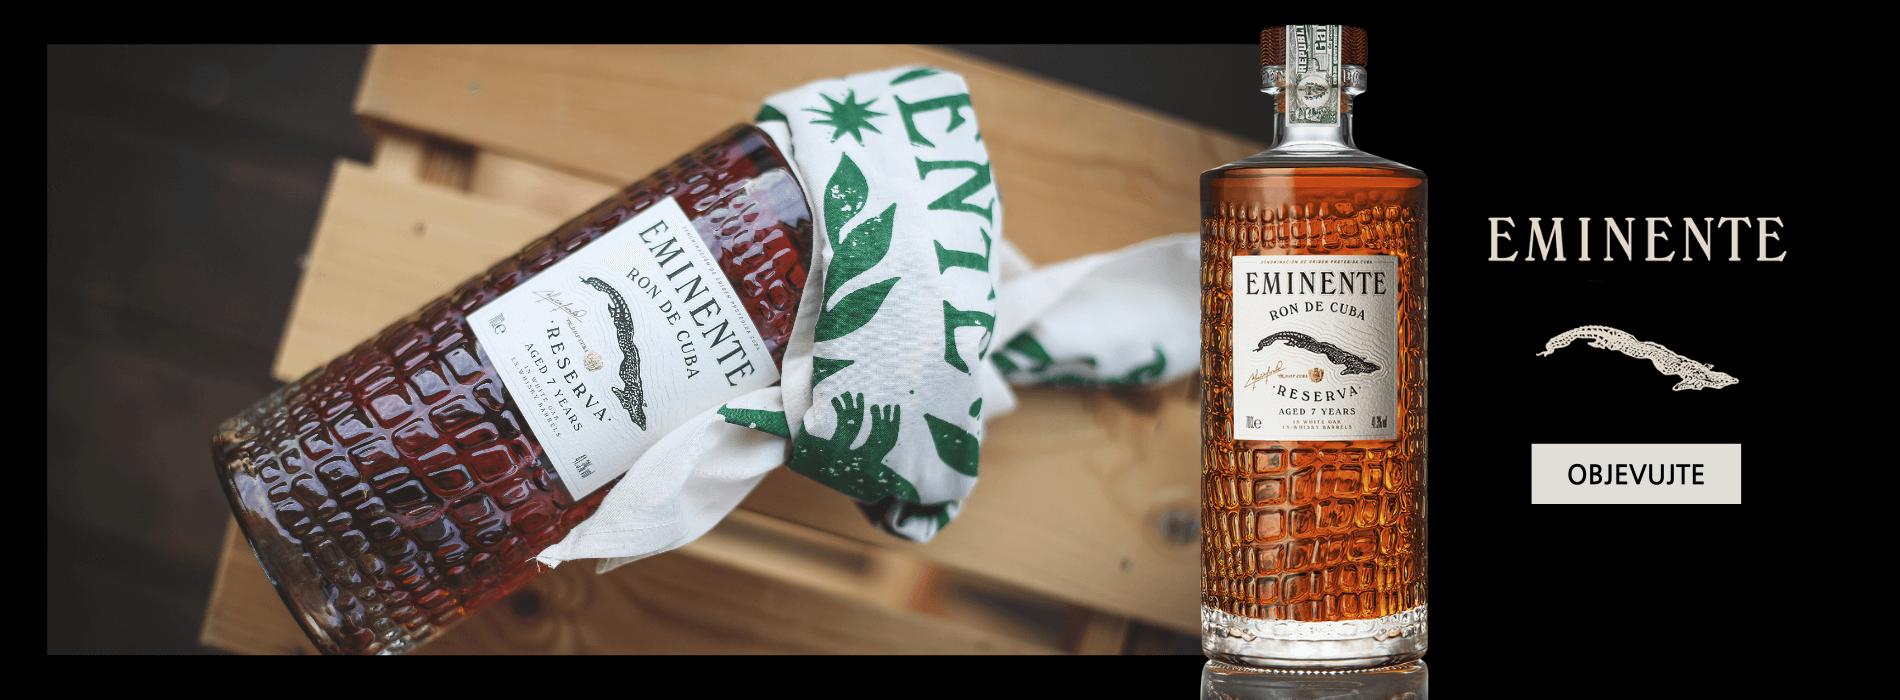 NOVINKA Eminente Reserva - tradiční kubánský Rum s Originálním Šátkem